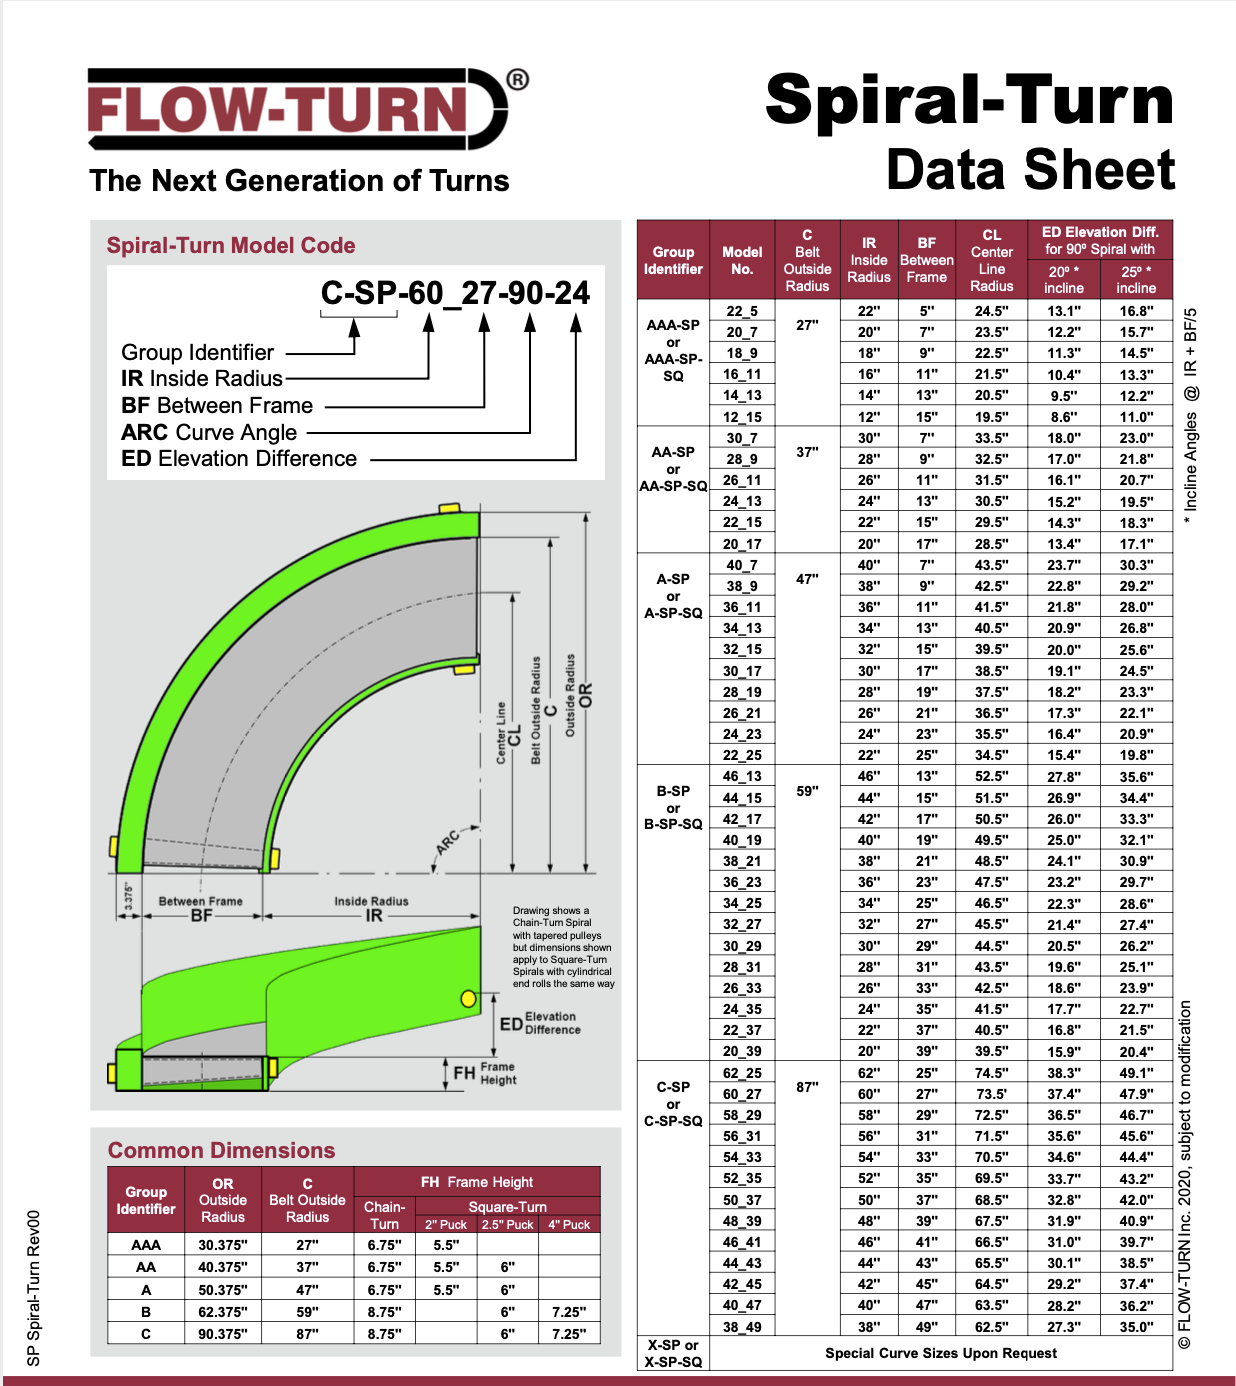 Spiral-Turn